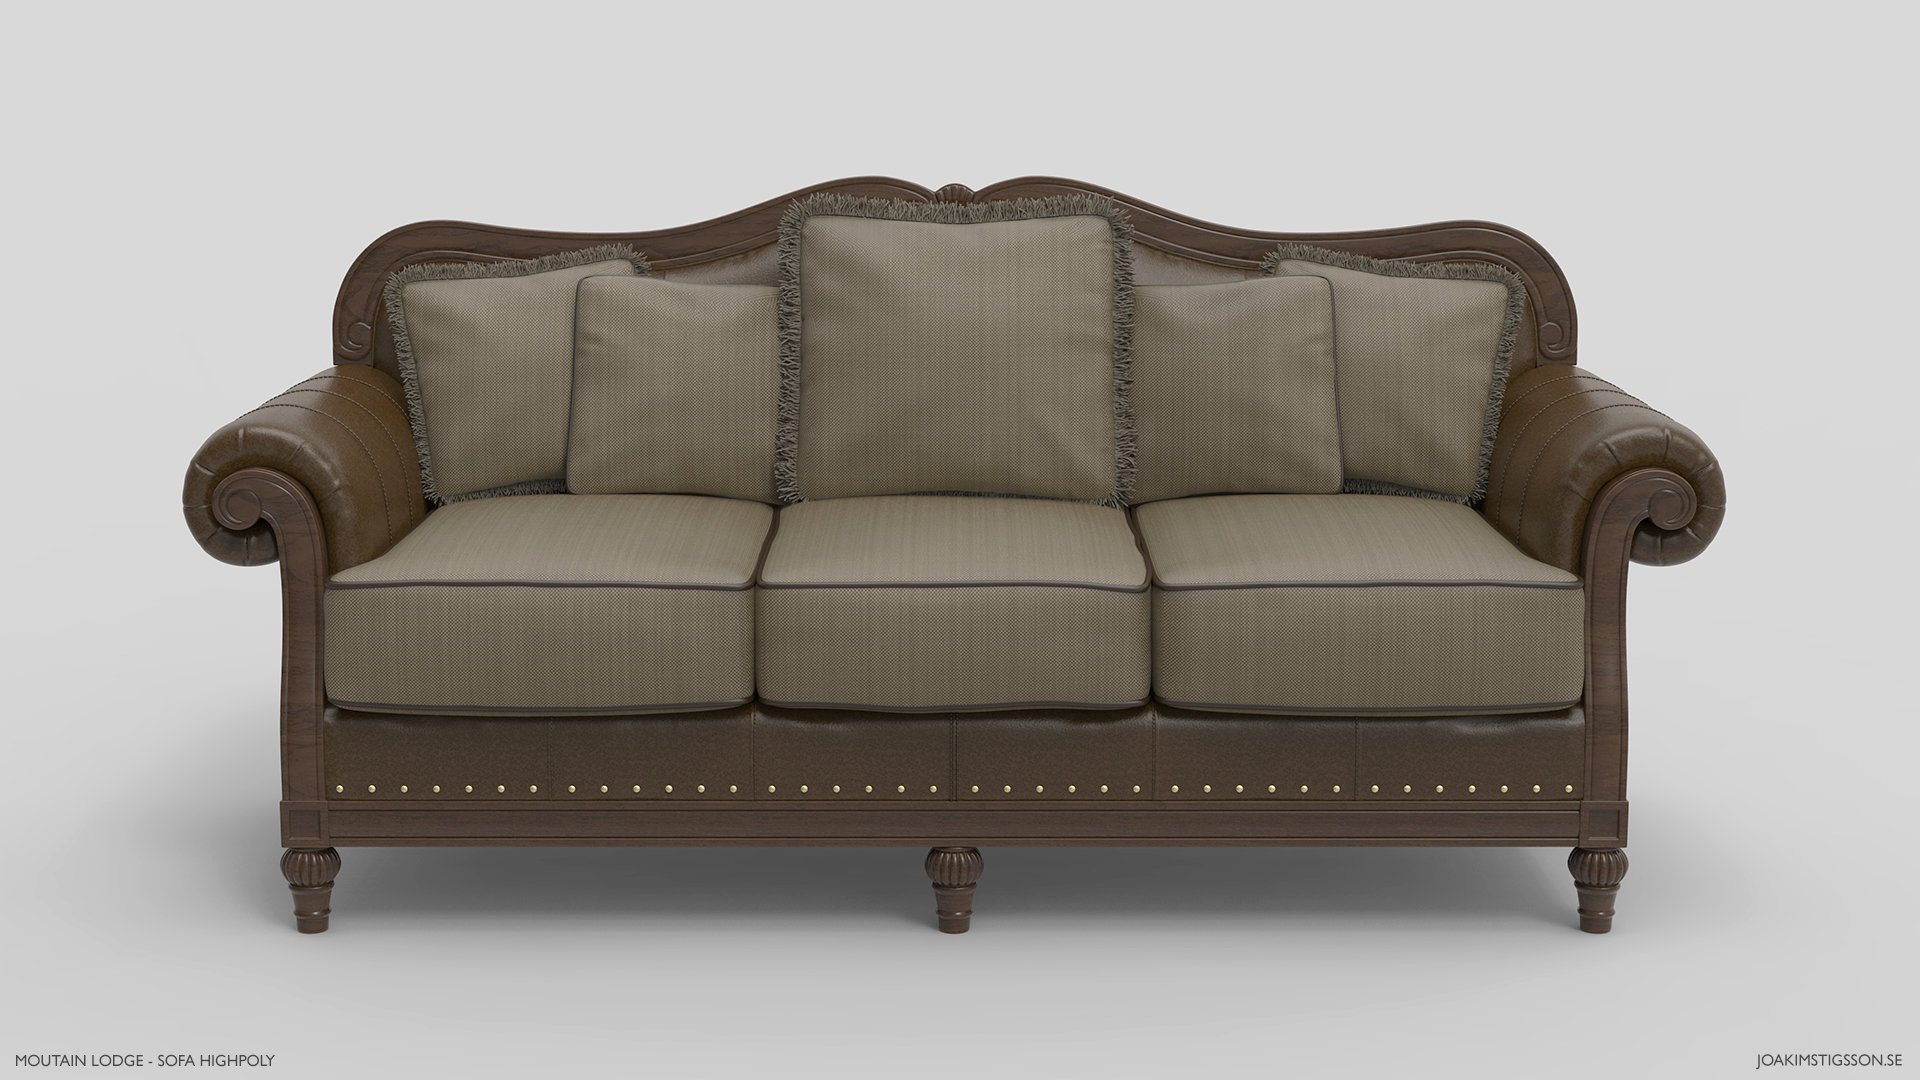 Joakim stigsson sofa a hp 01